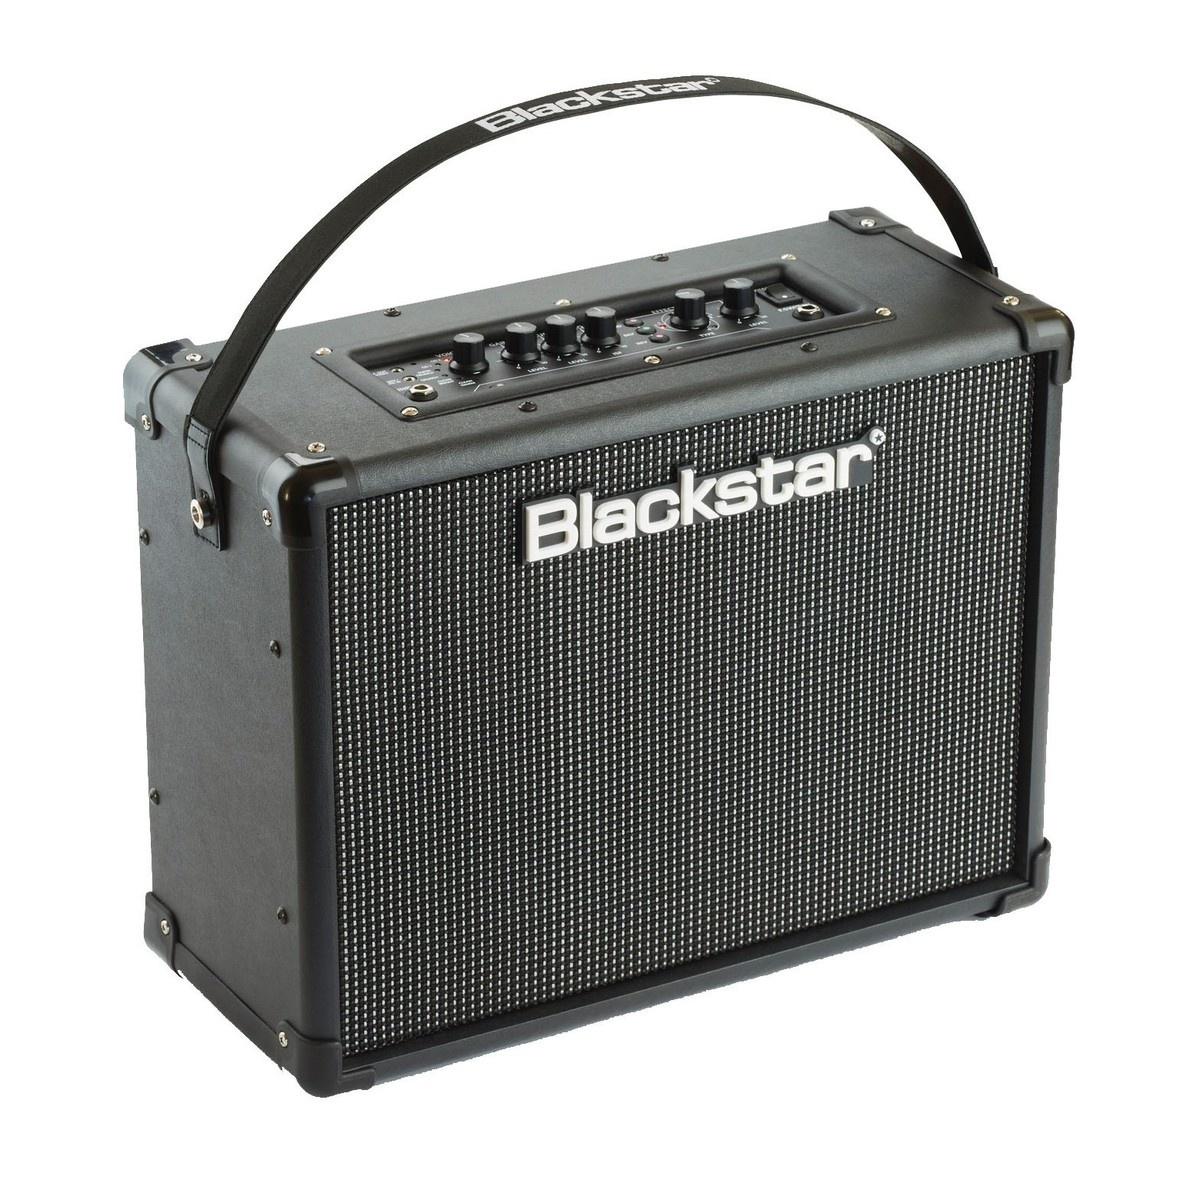 Blackstar Blackstar ID:Core 40 Stereo V2 Combo